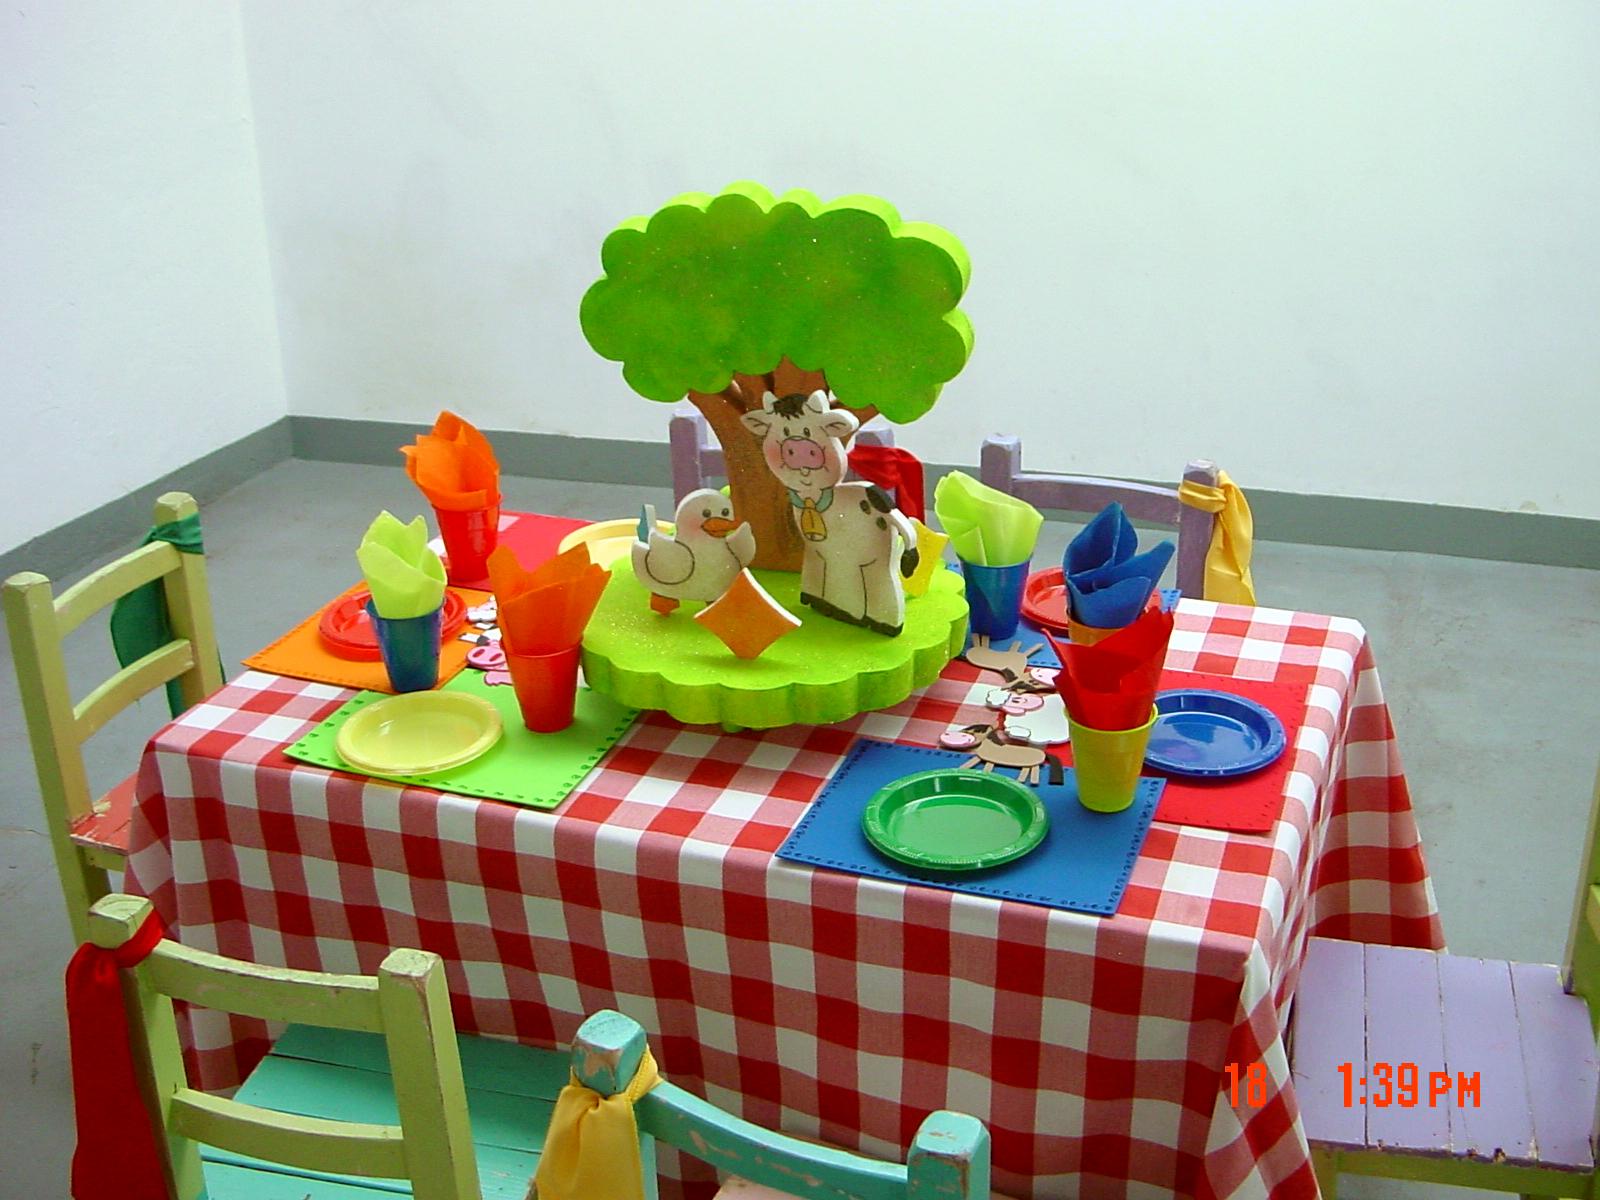 Decoracion fiesta primera comunion fiestas infantiles for Fiestas comunion decoracion